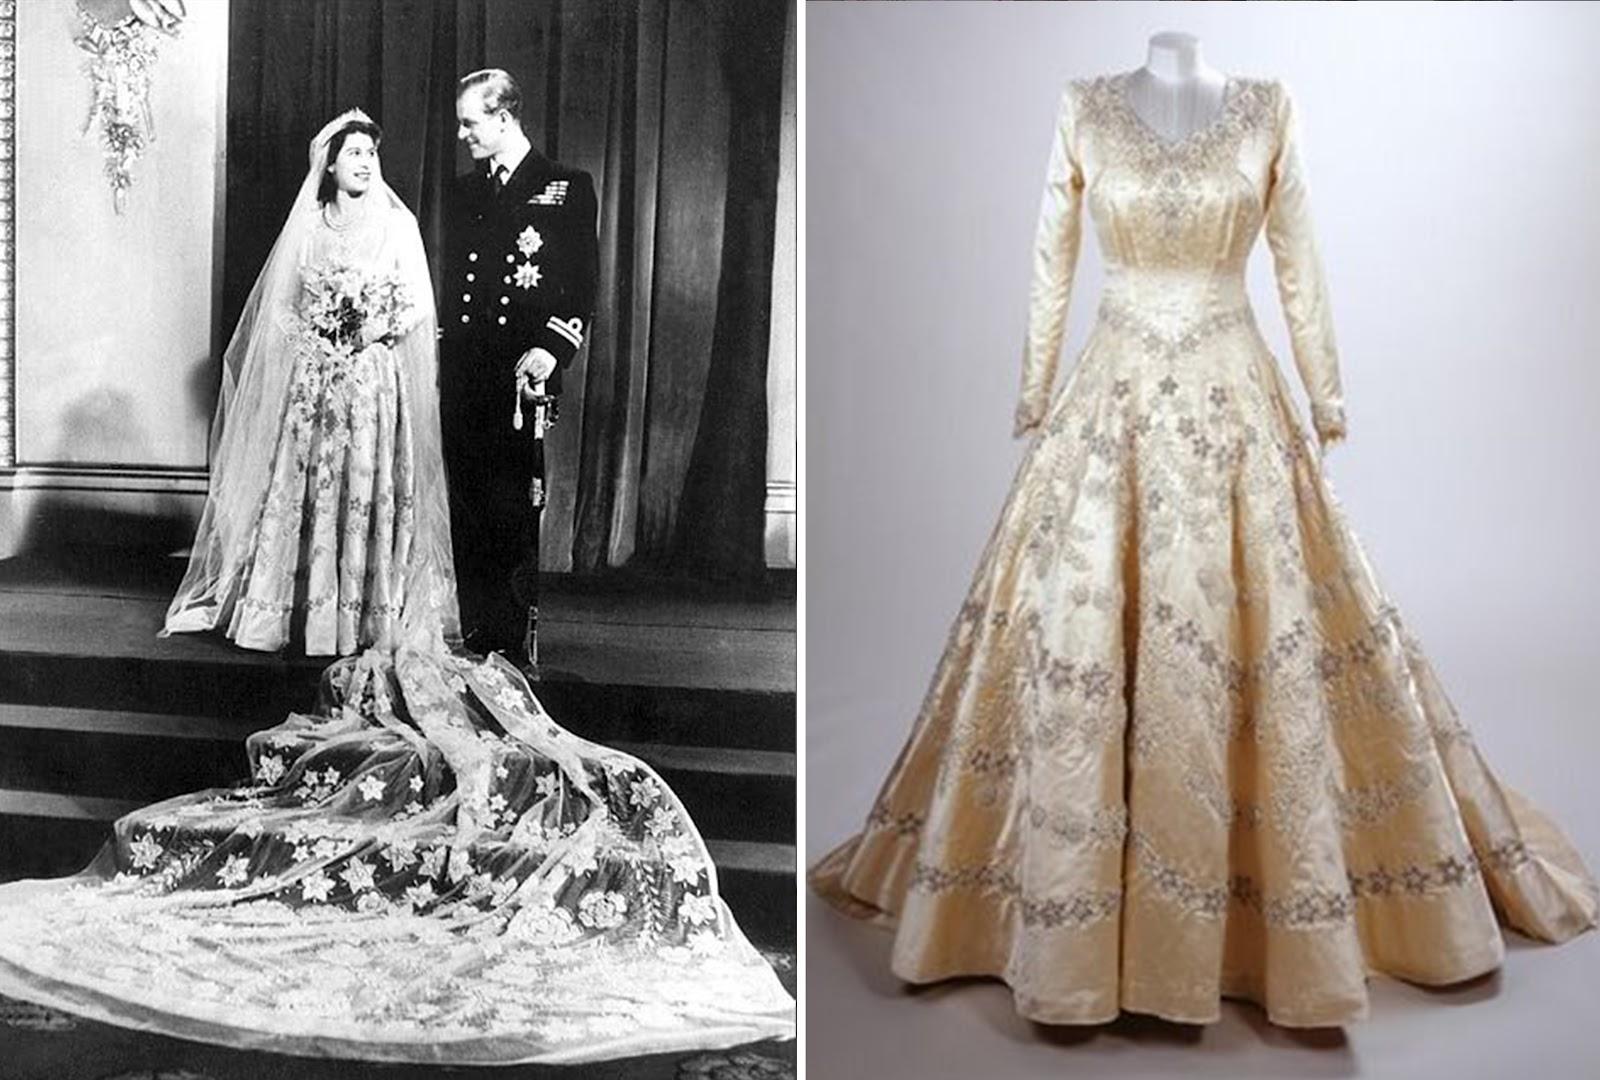 Queen elizabeth ii wedding dress lime green gown with crinoline